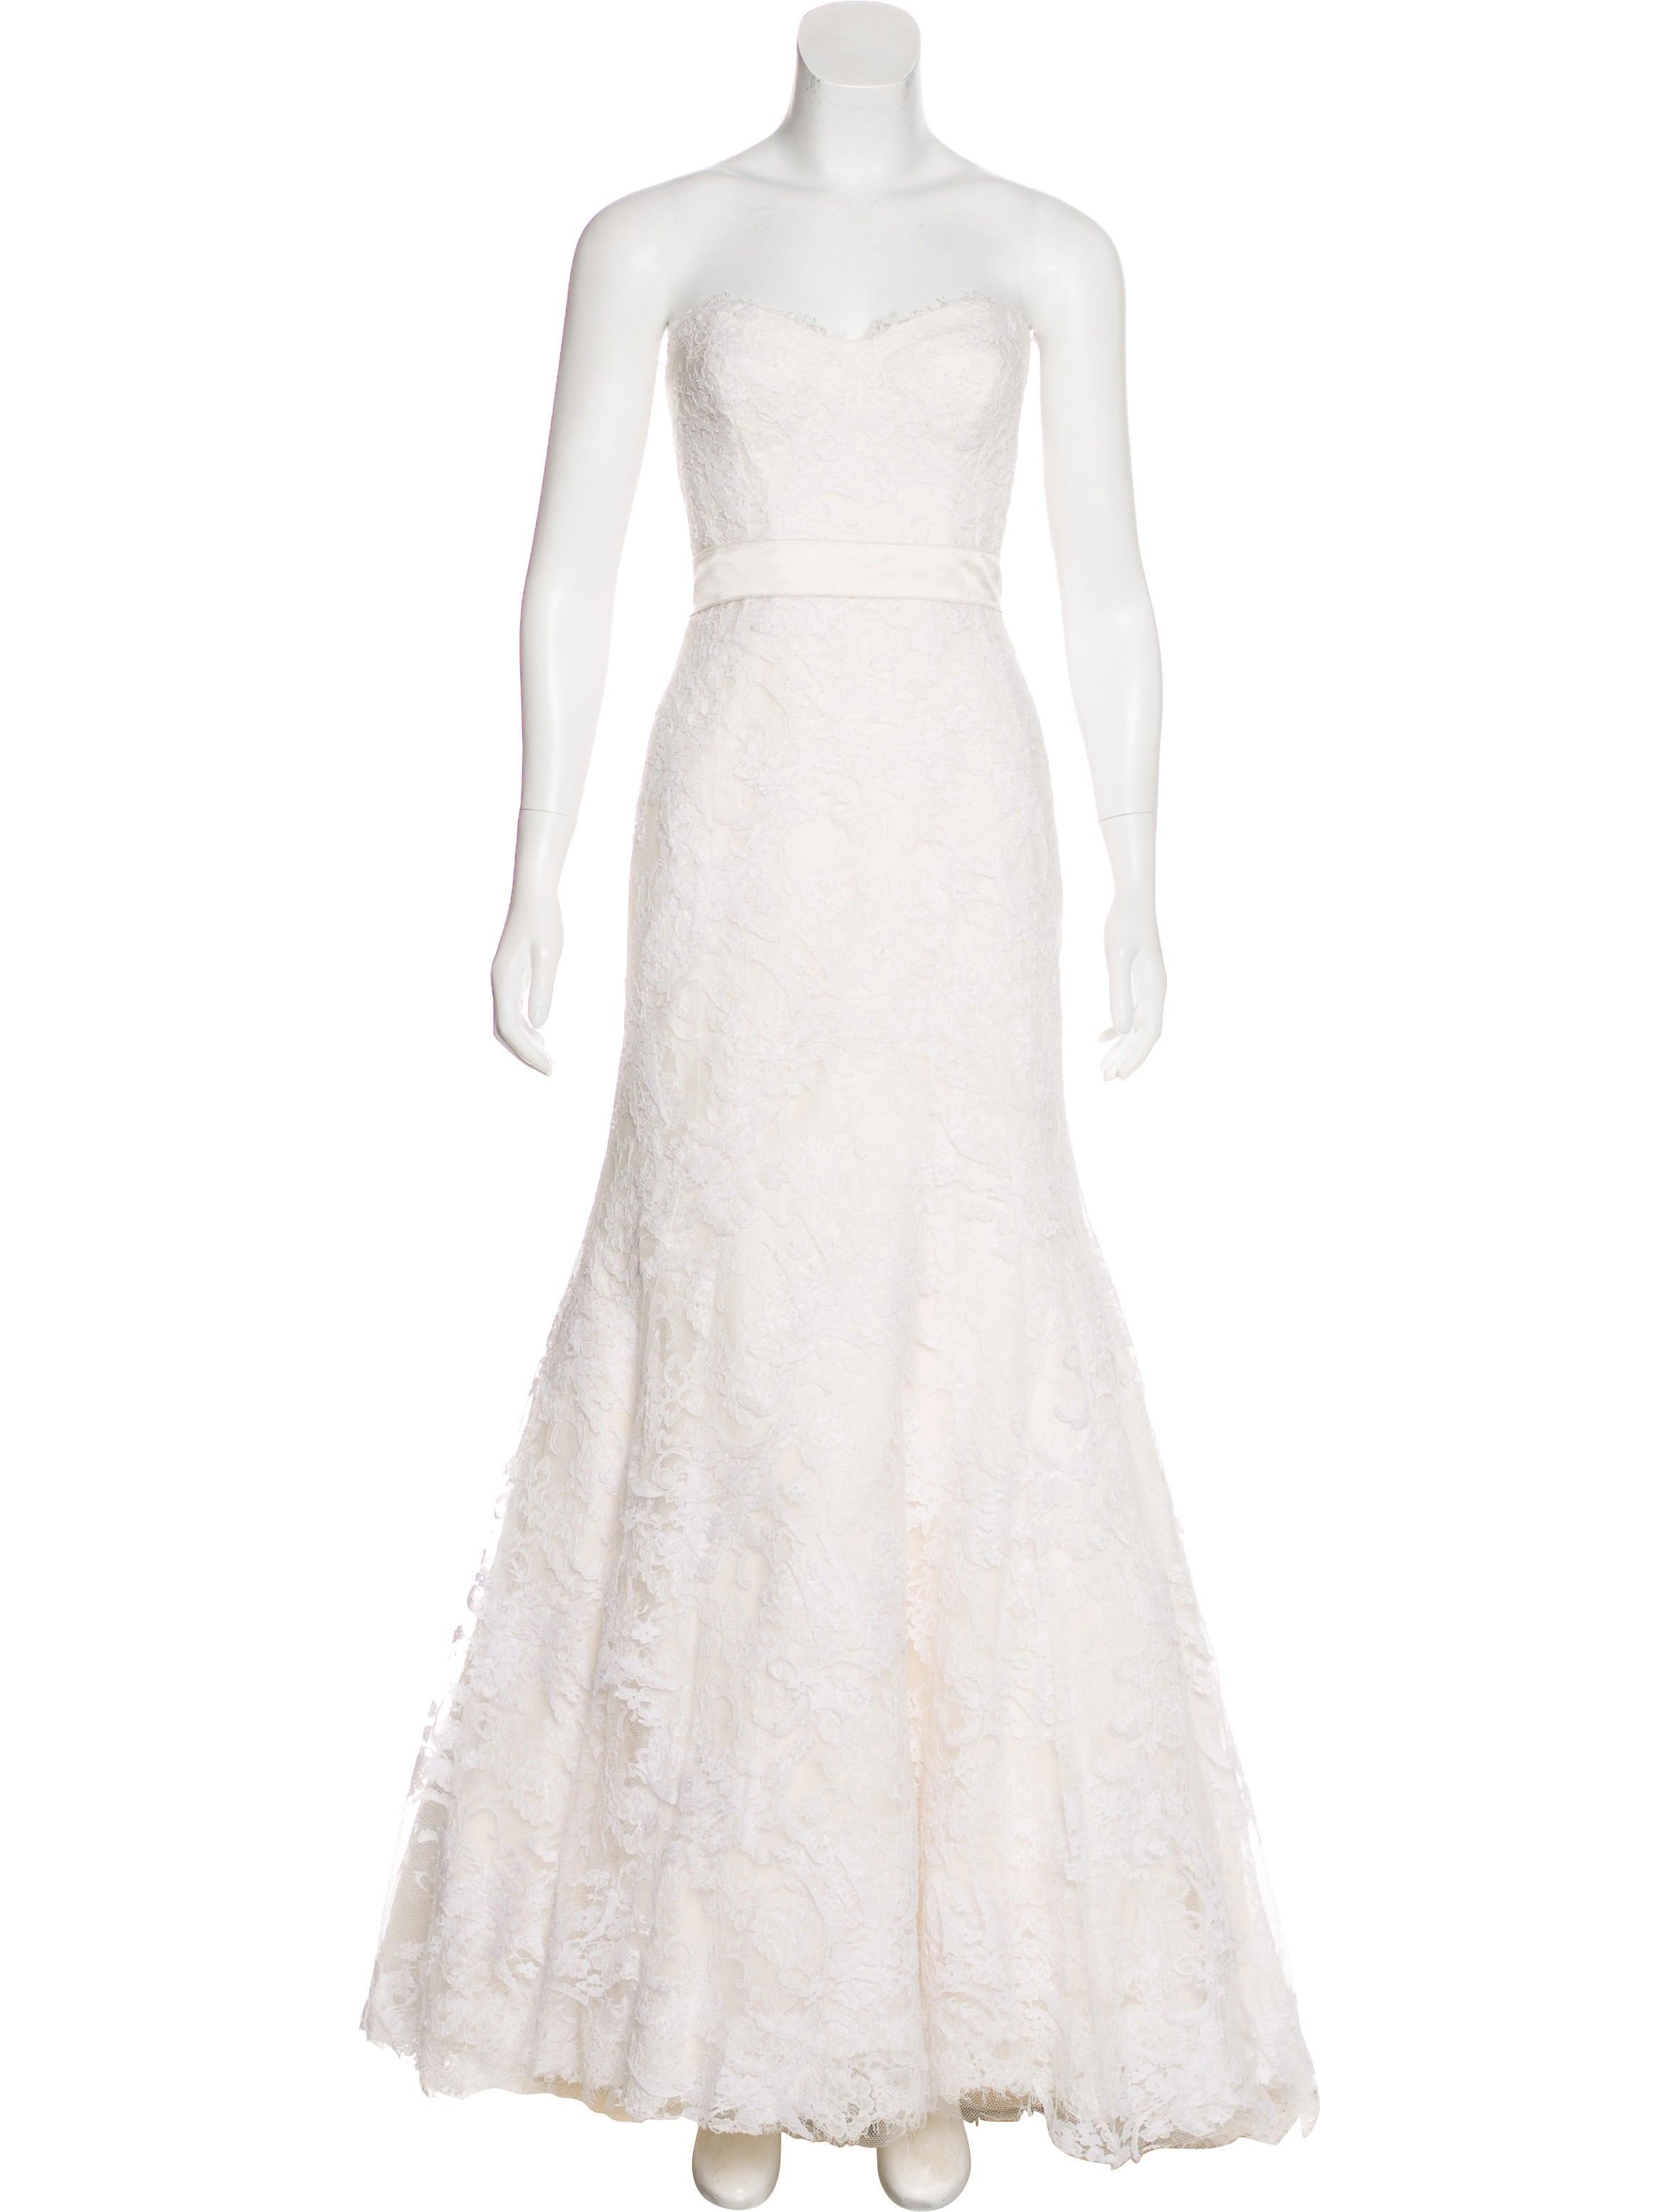 Monique Lhuillier Lace Wedding Gown Clothing Moi22120 The